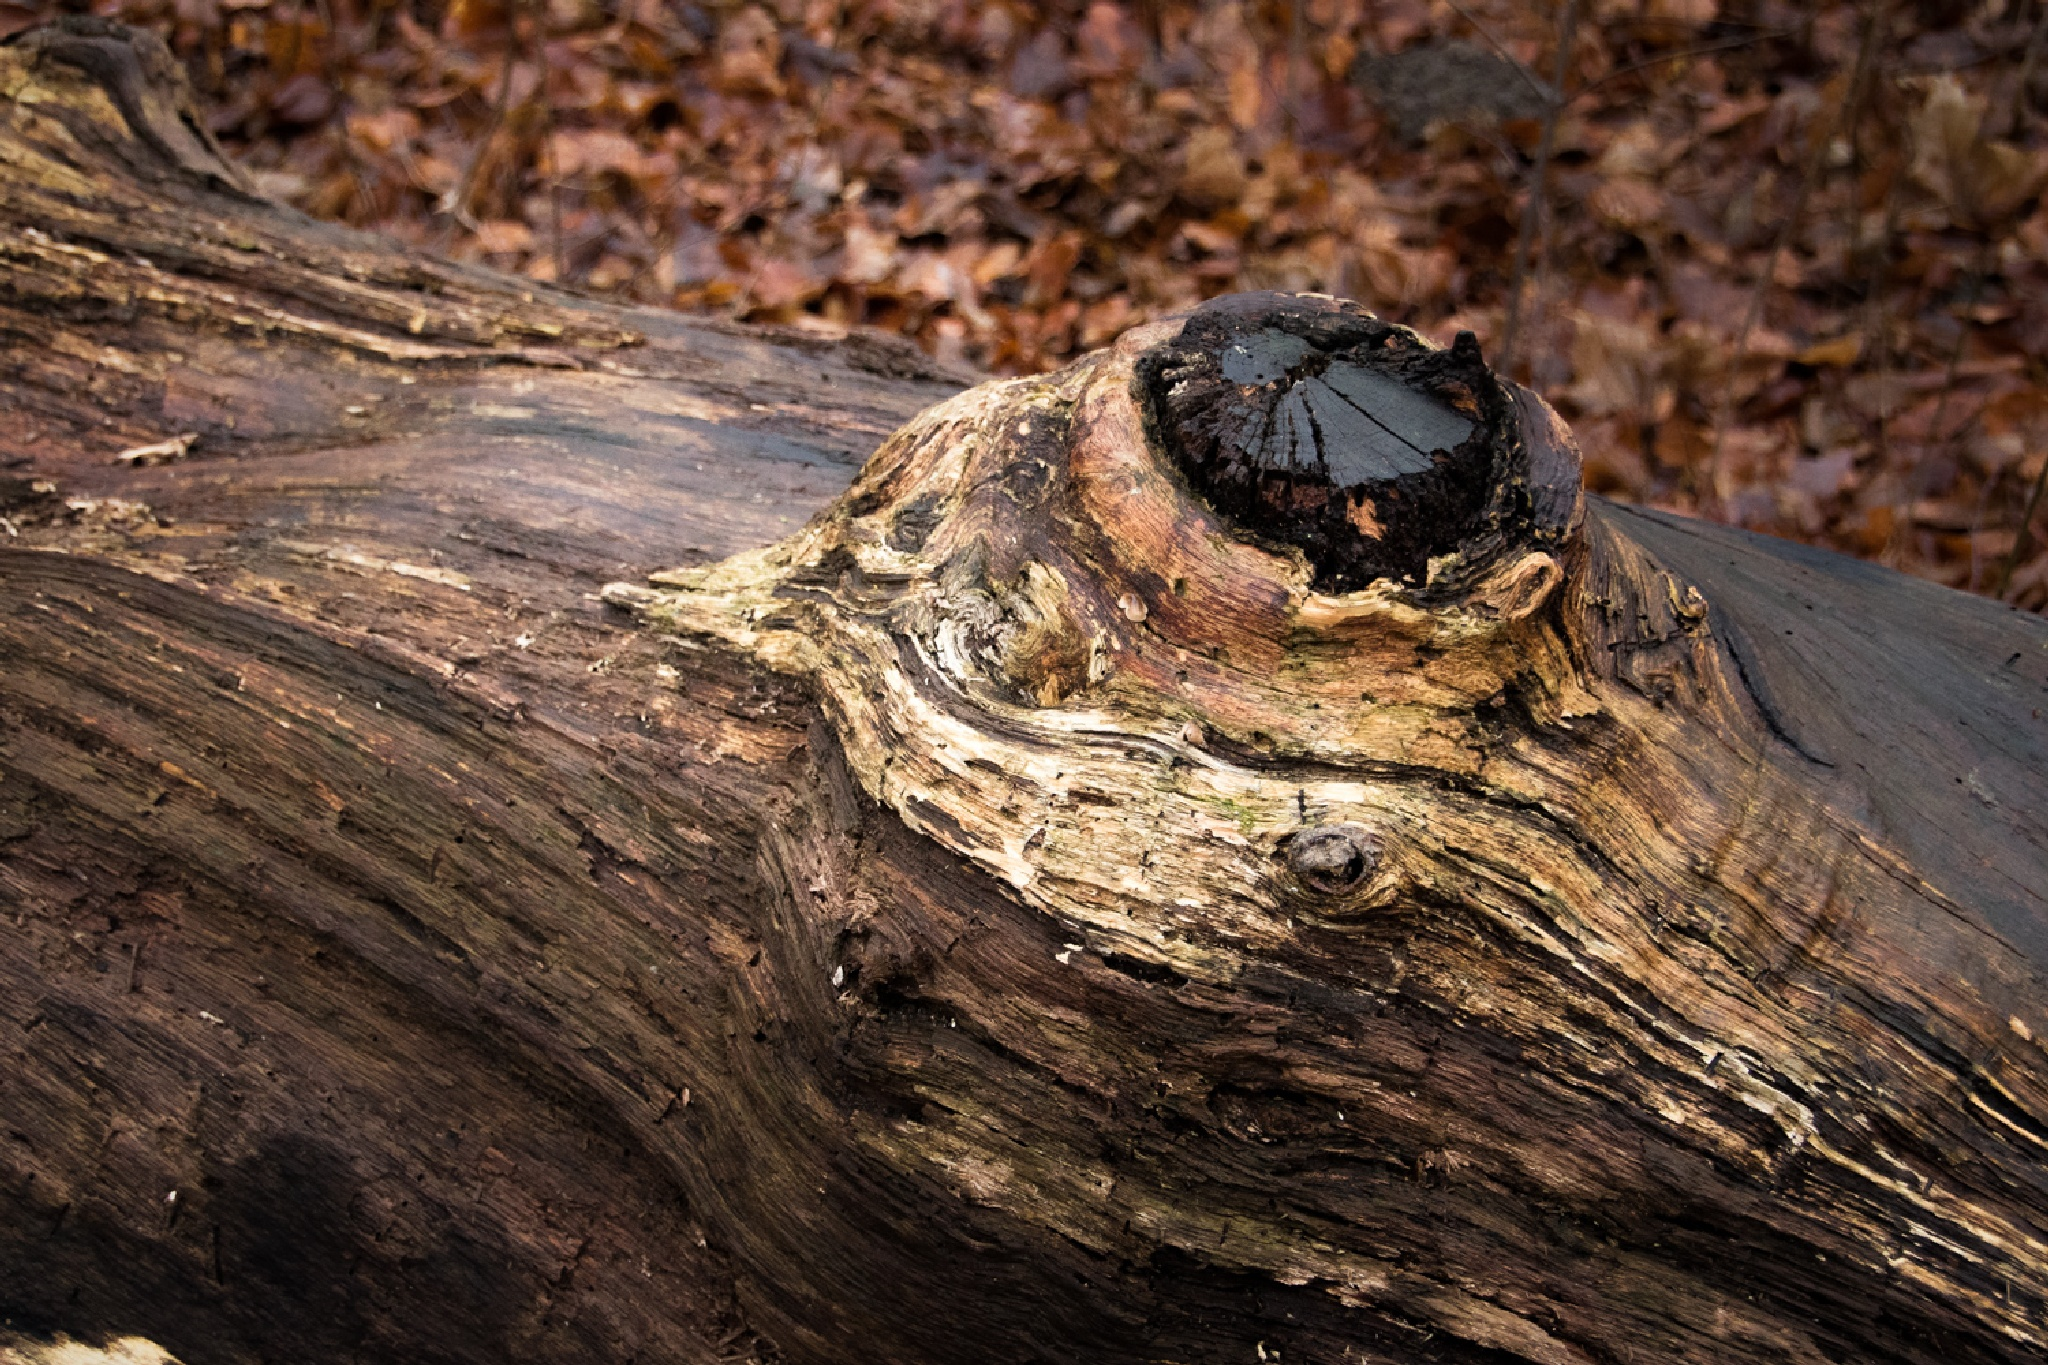 Old tree stump by maybritt hansen